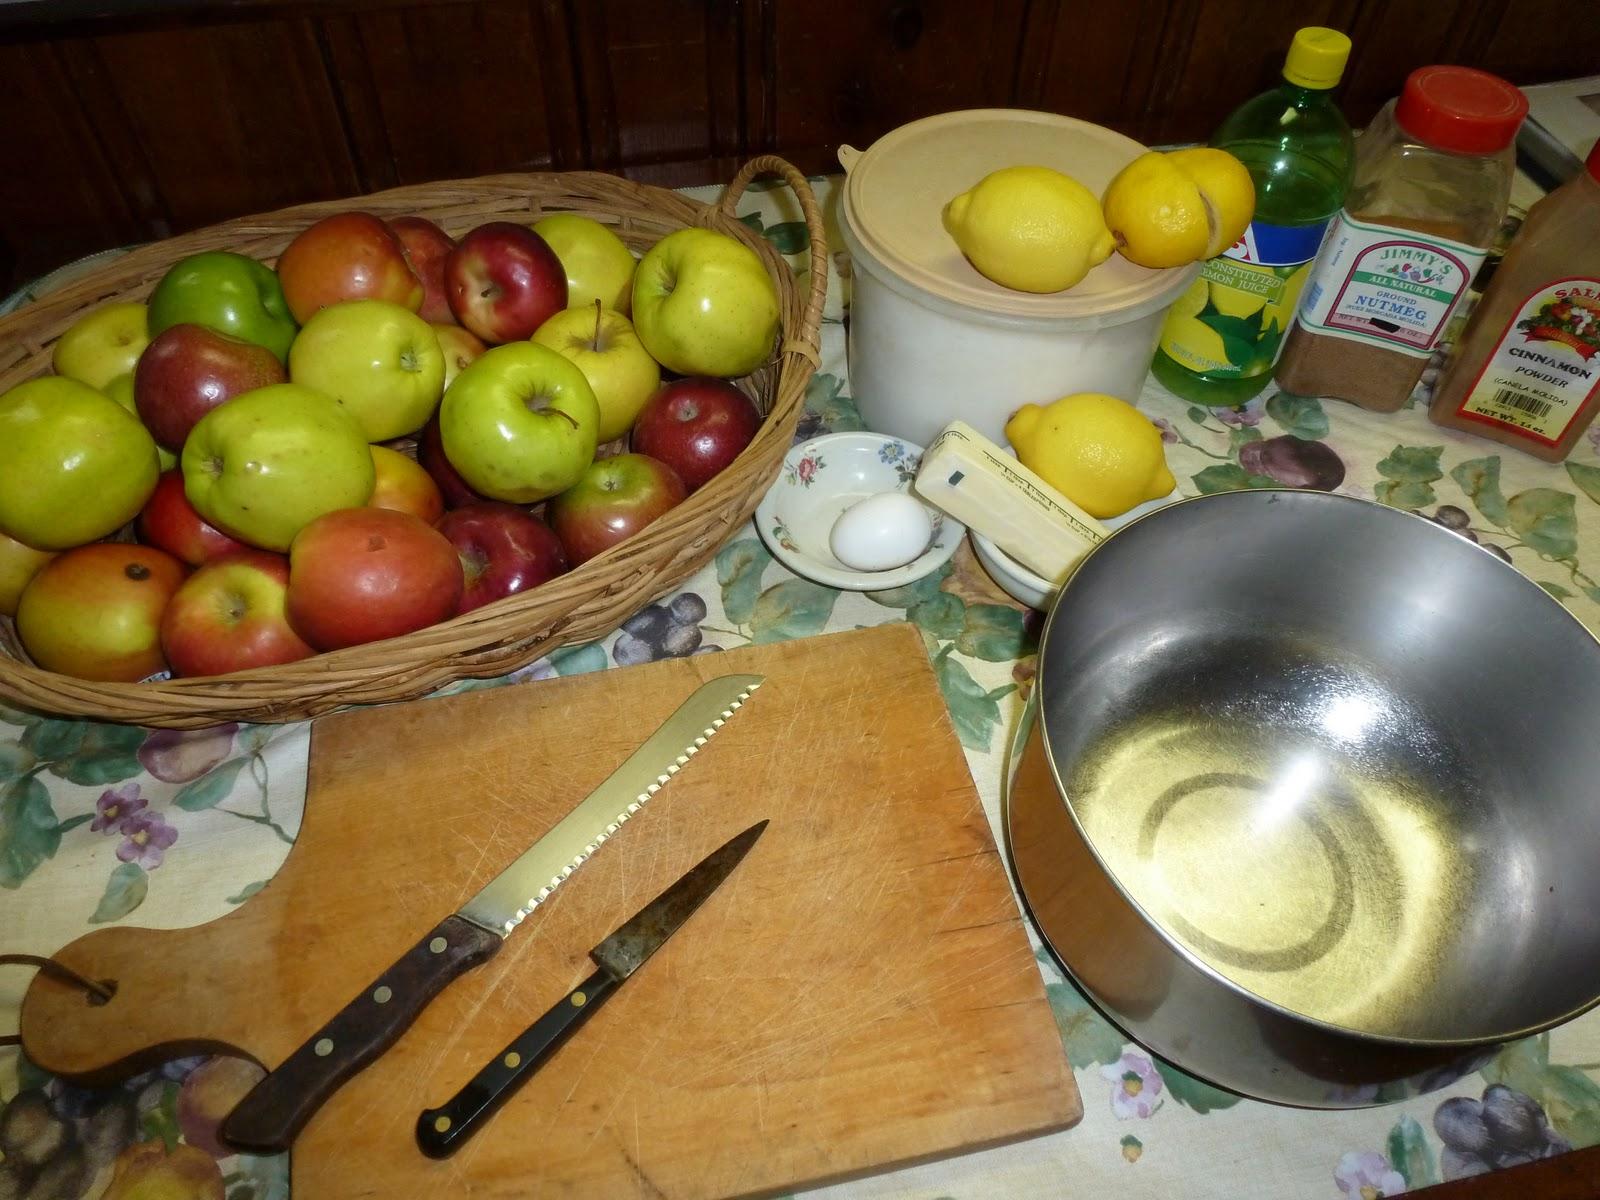 Making apple pie by david white